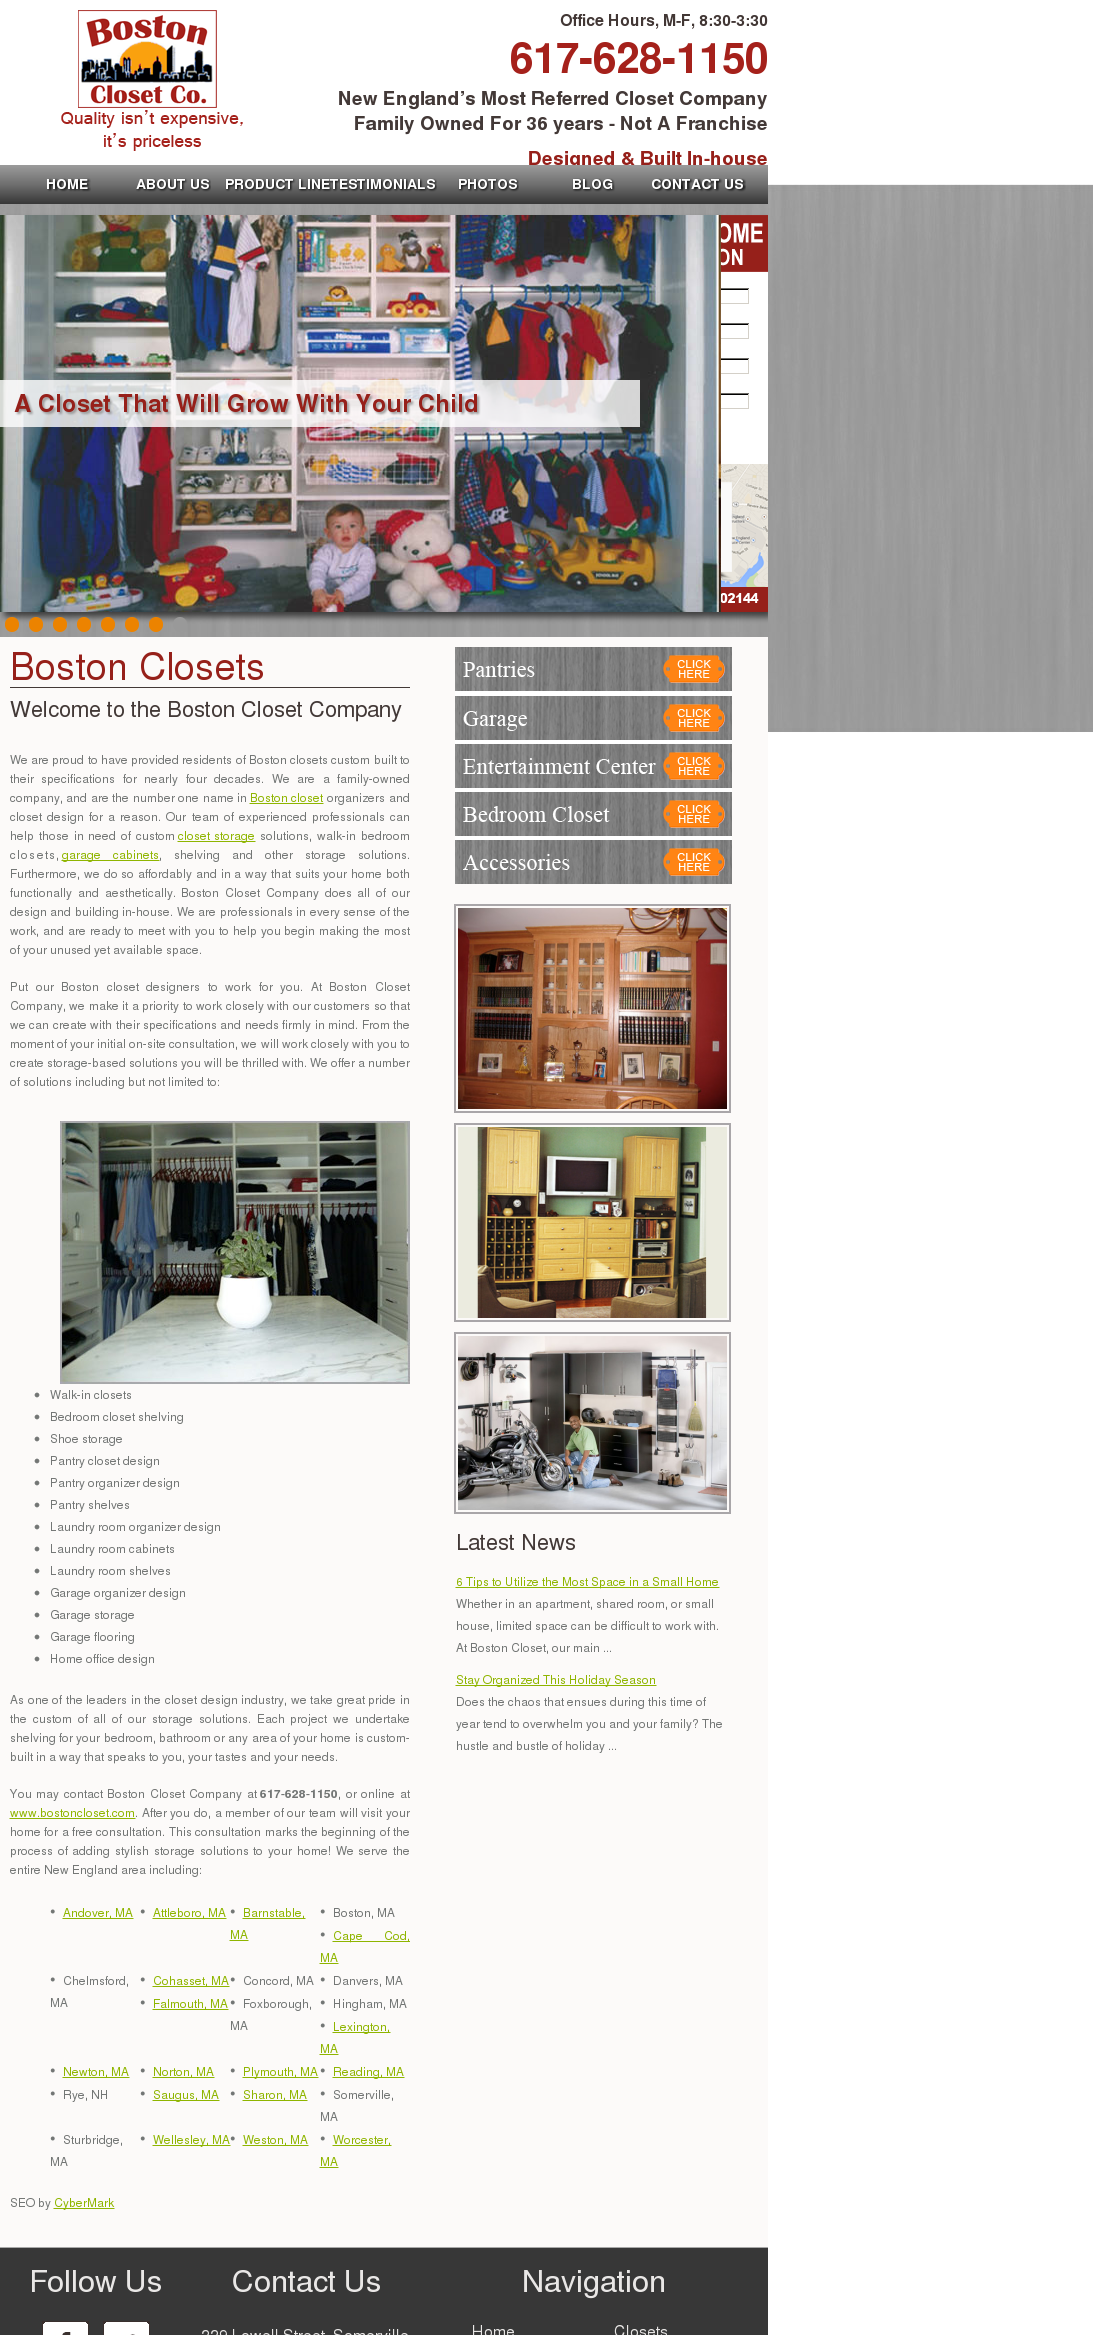 Charmant Boston Closet Competitors, Revenue And Employees   Owler Company Profile